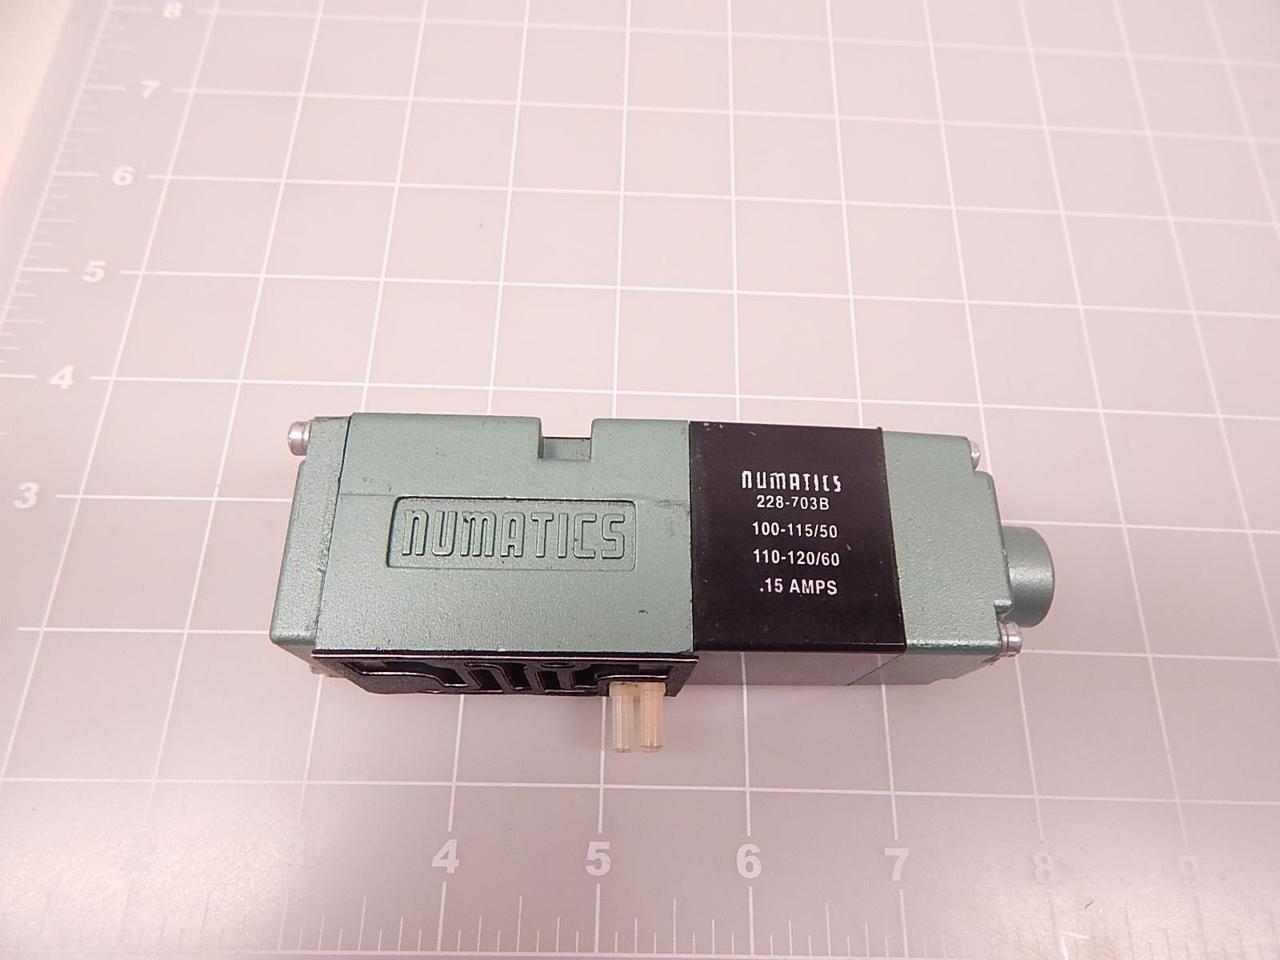 ASCO NUMATICS 228-703B 110/120V-60HZ, Solenoid Valve Coil.15AMP, 100/115V 50HZ